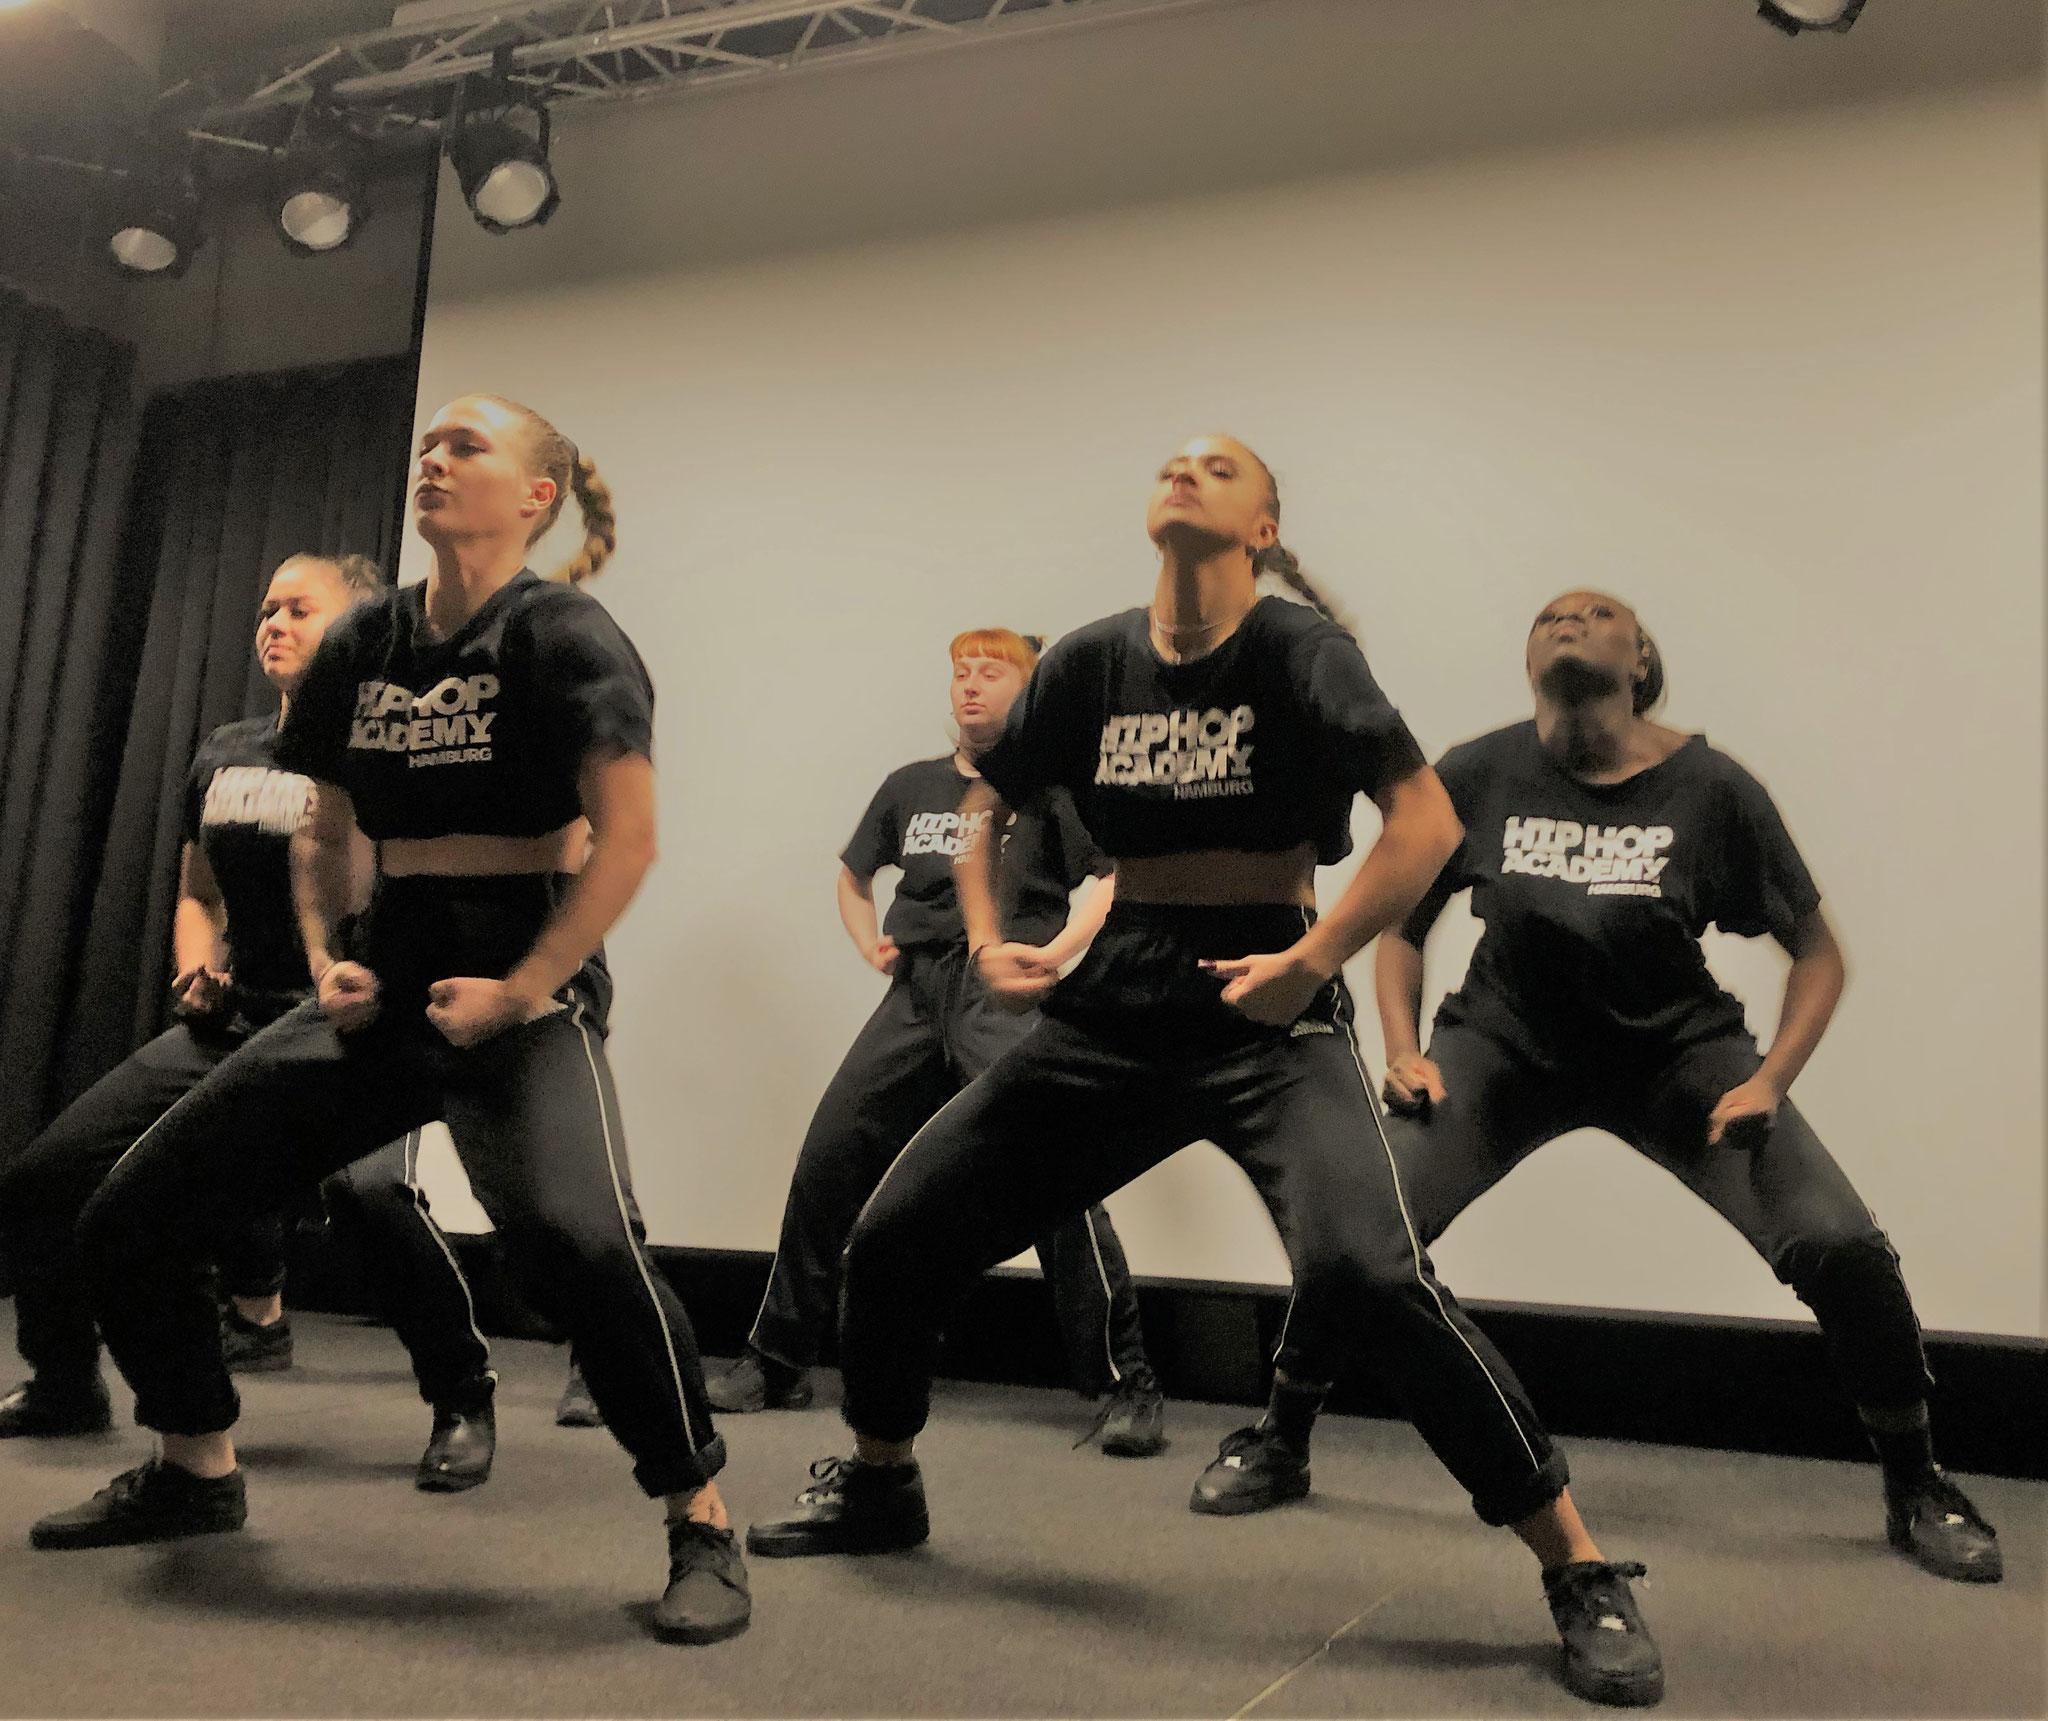 Tanzgruppe Apocalypso